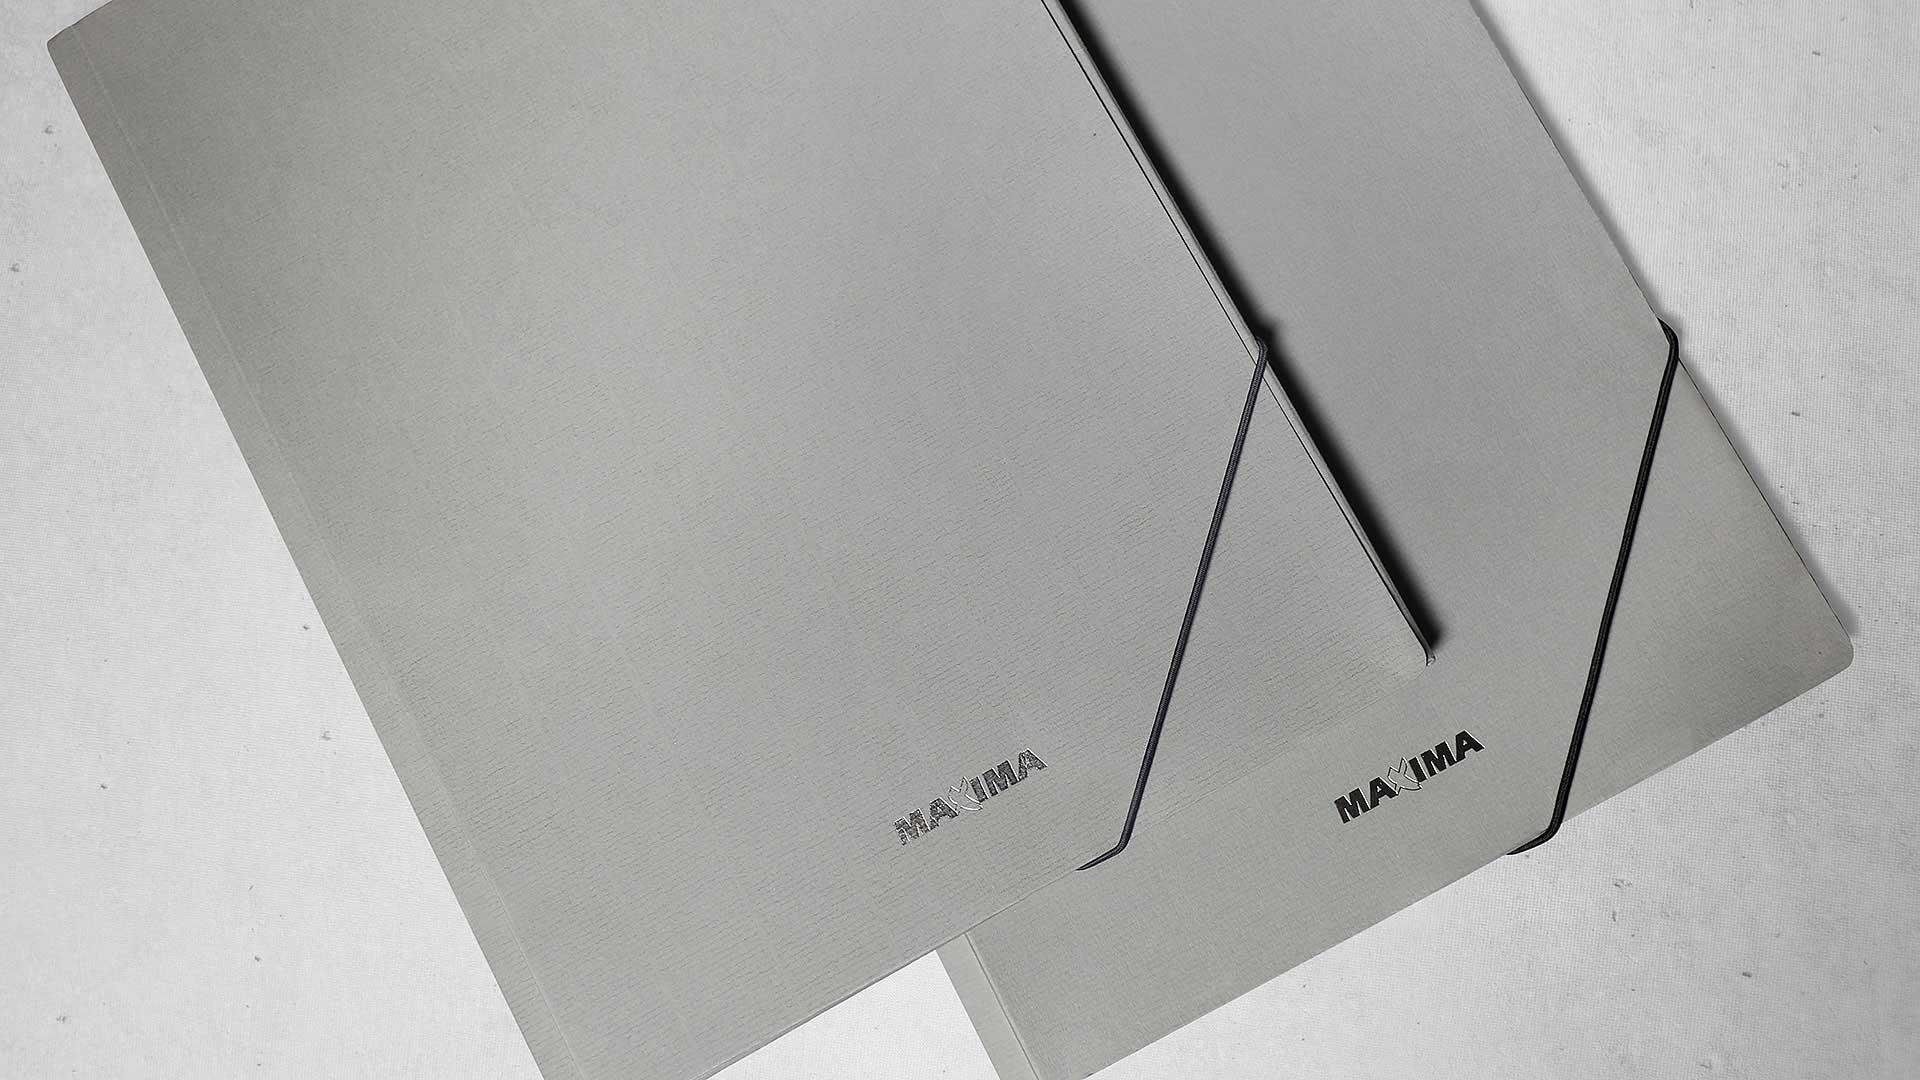 Mapes ar gumiju un mapju izgatavošana Maxima